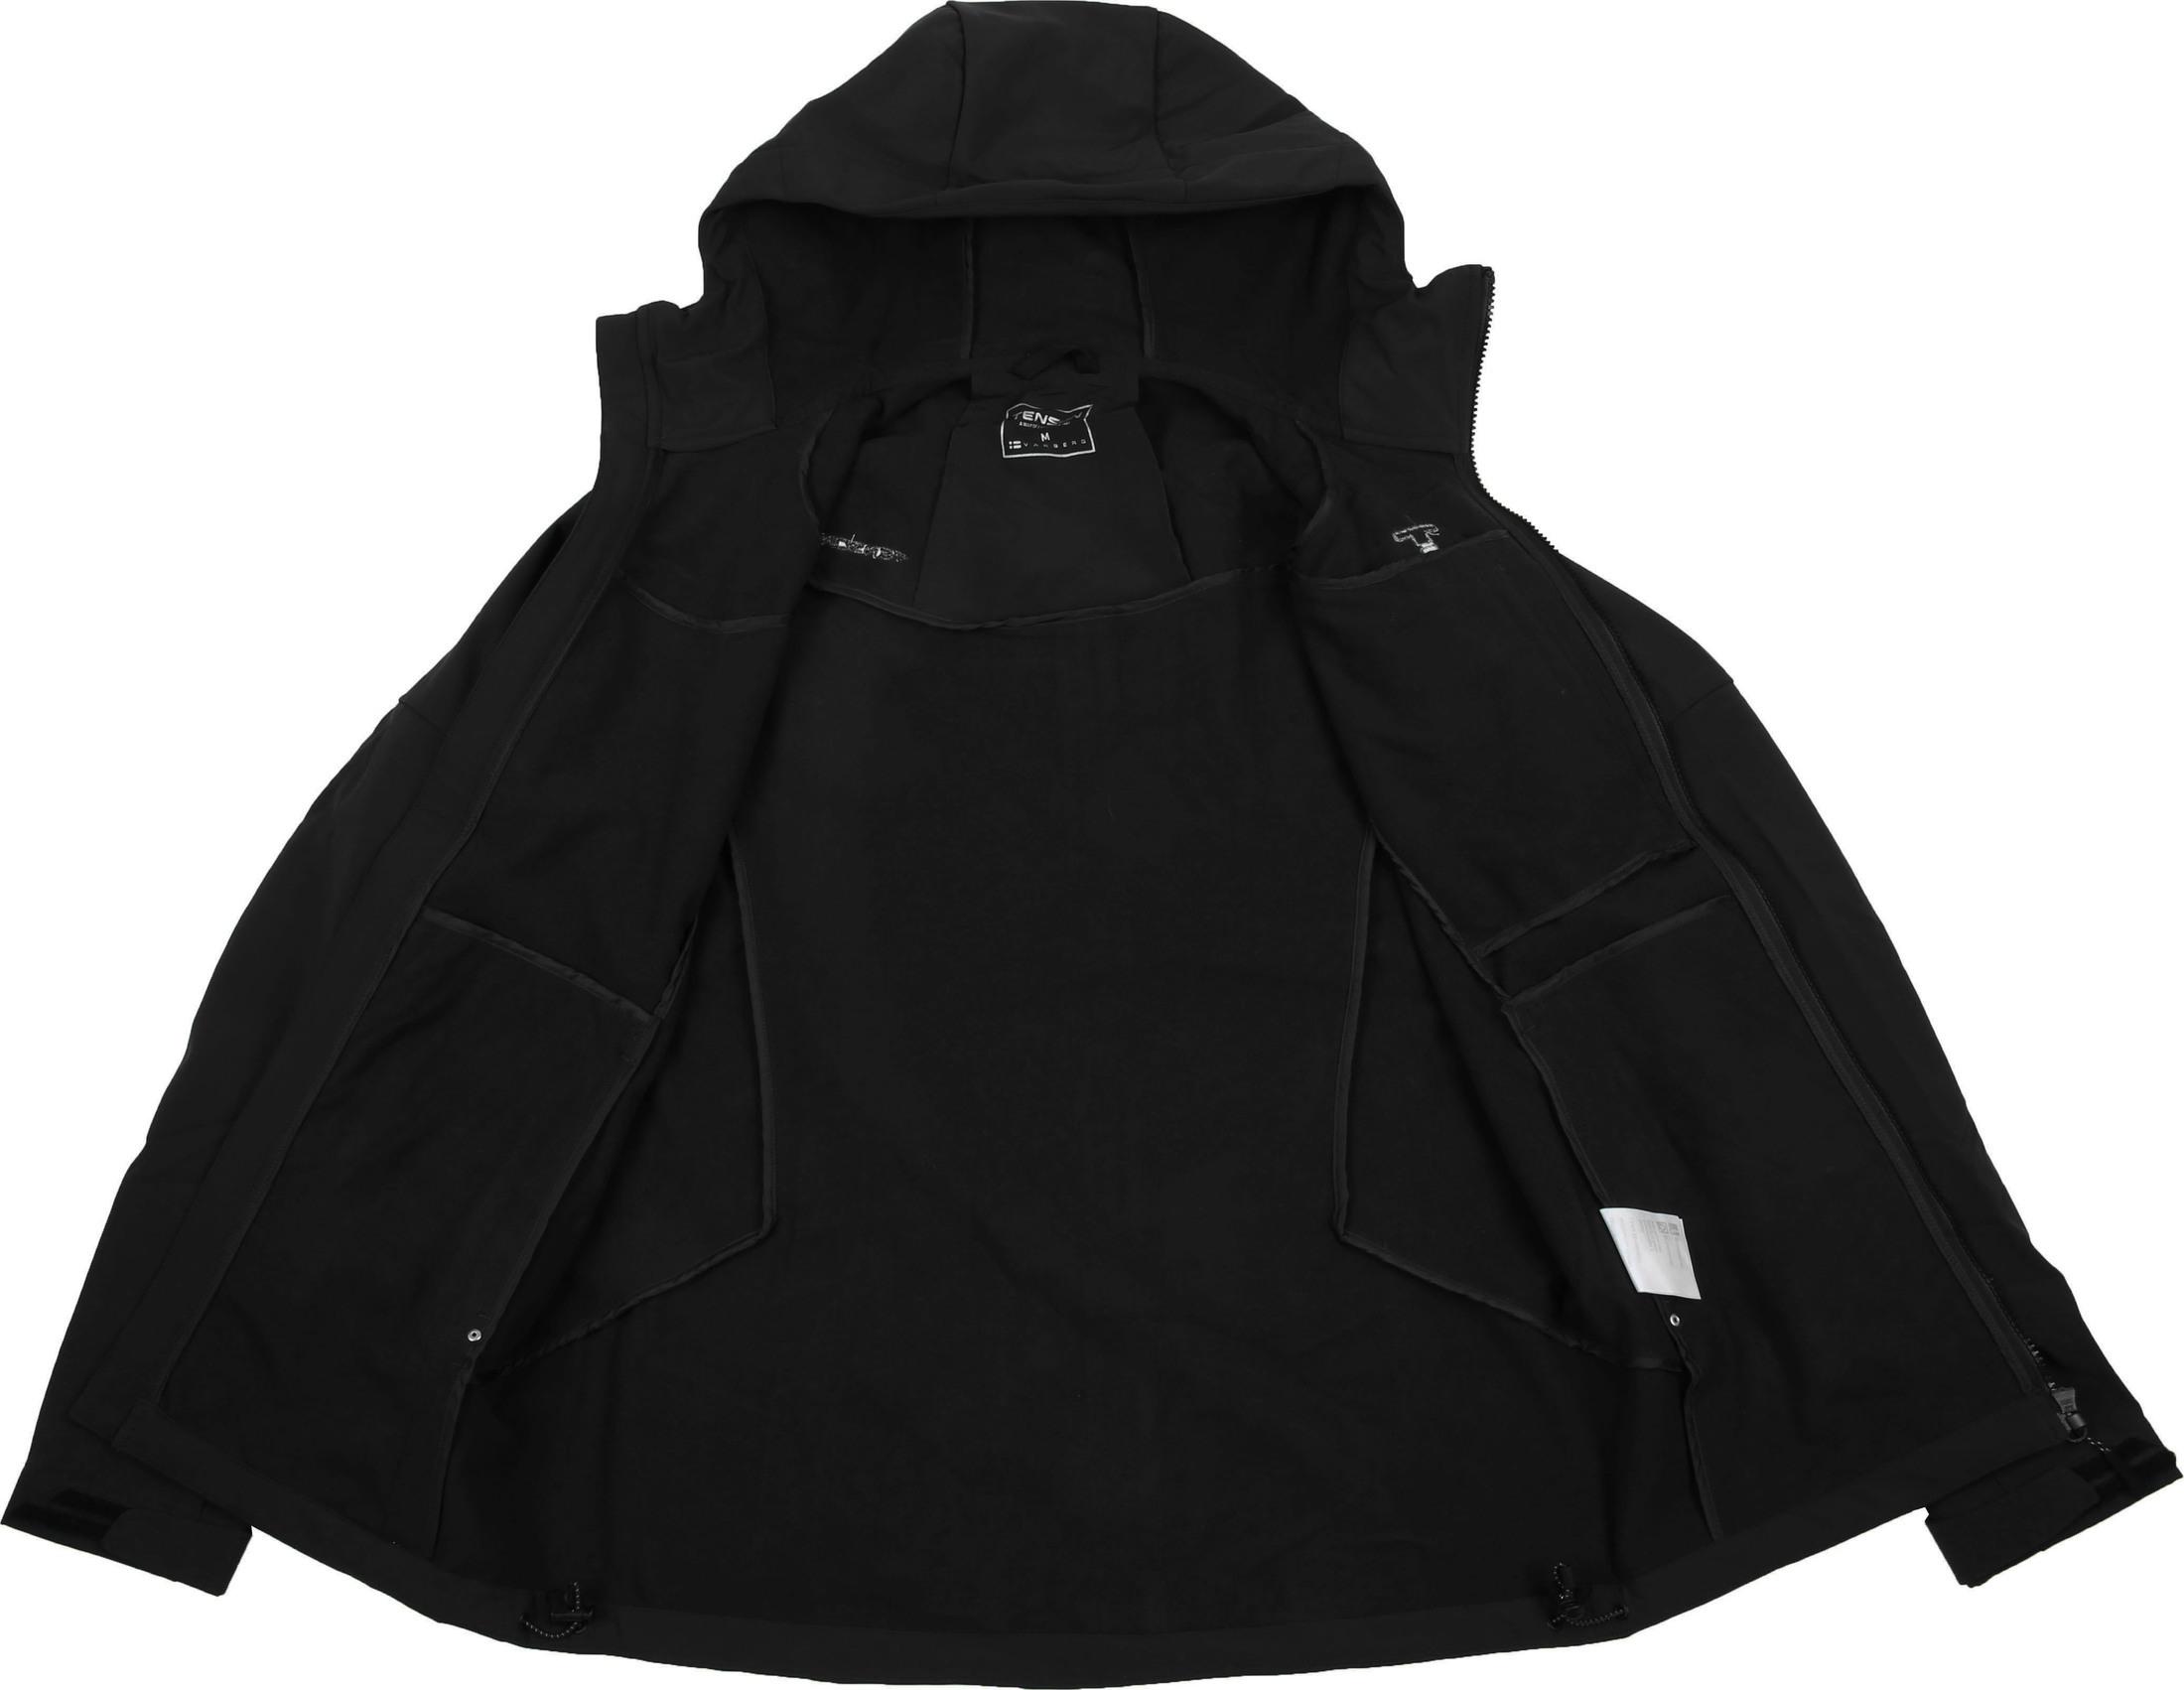 Tenson Taurid Jacket Black foto 5